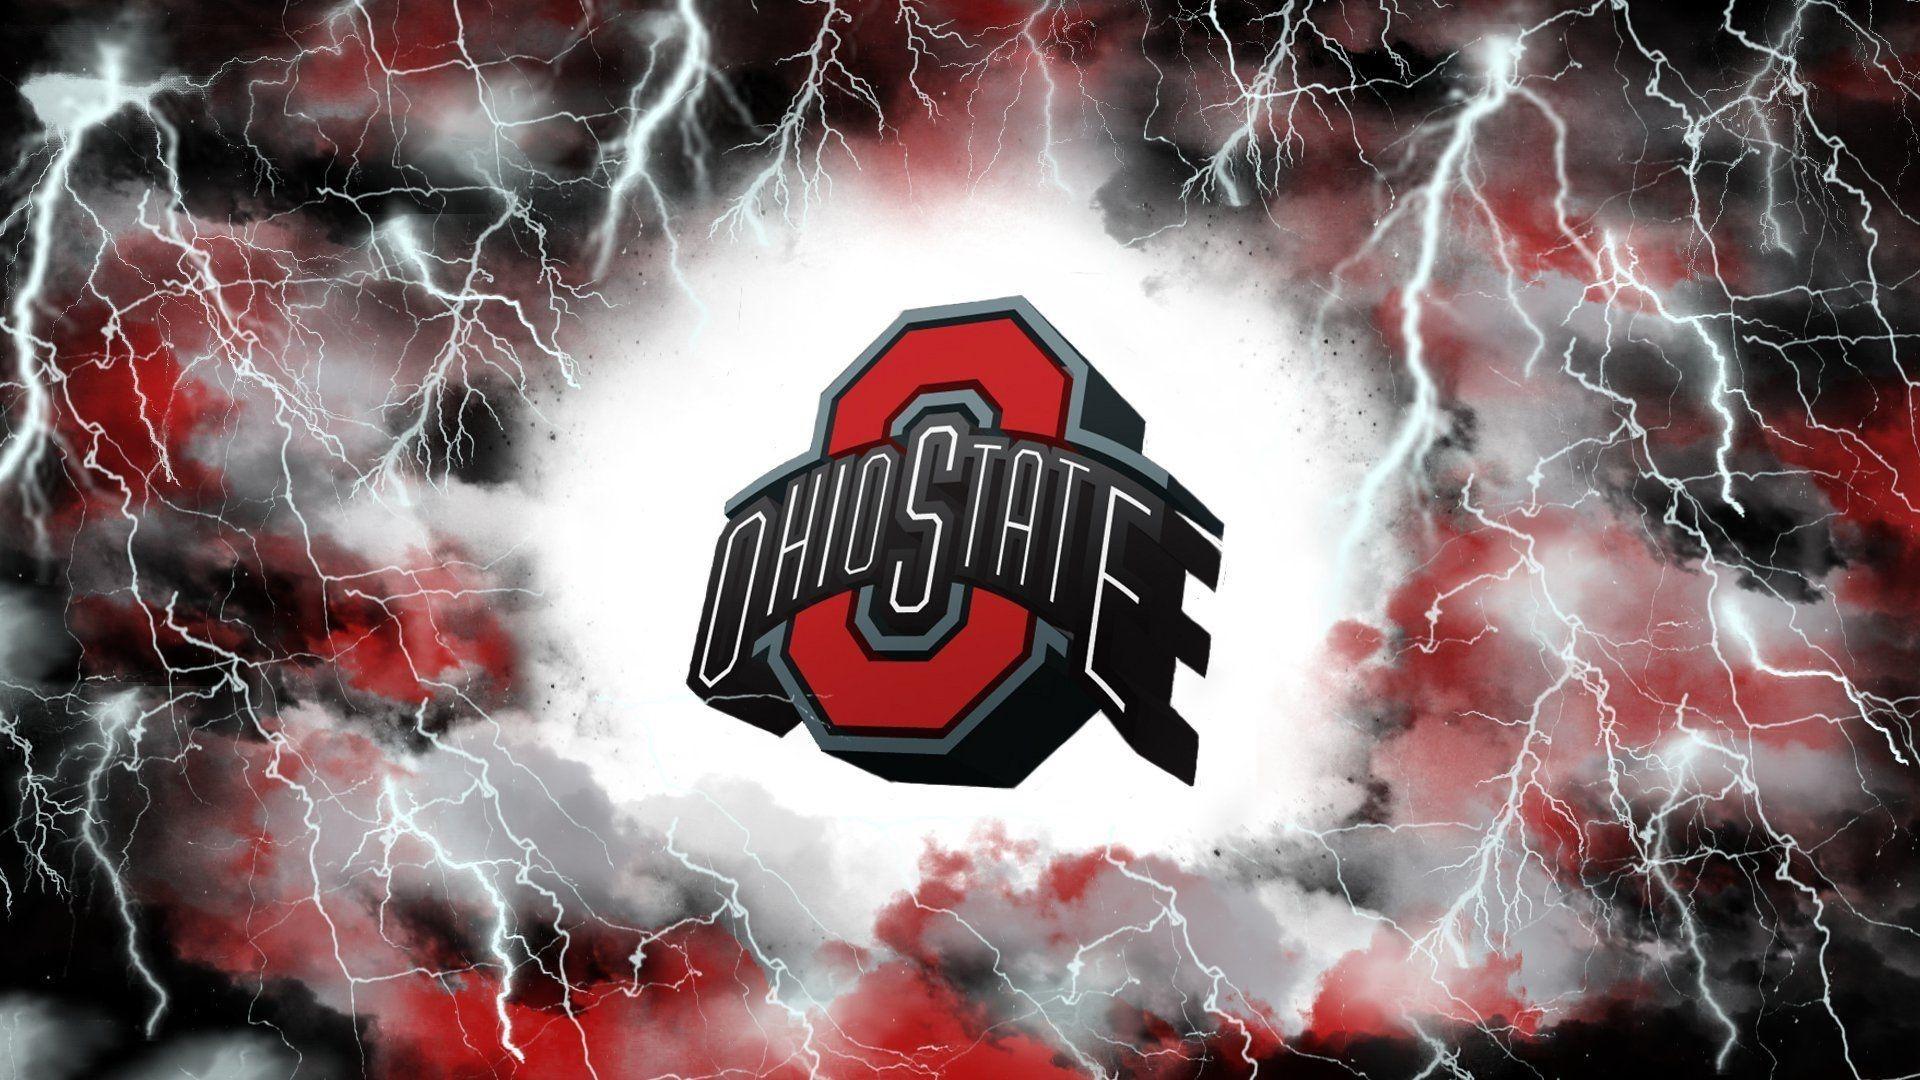 Ohio State Full HD Wallpaper